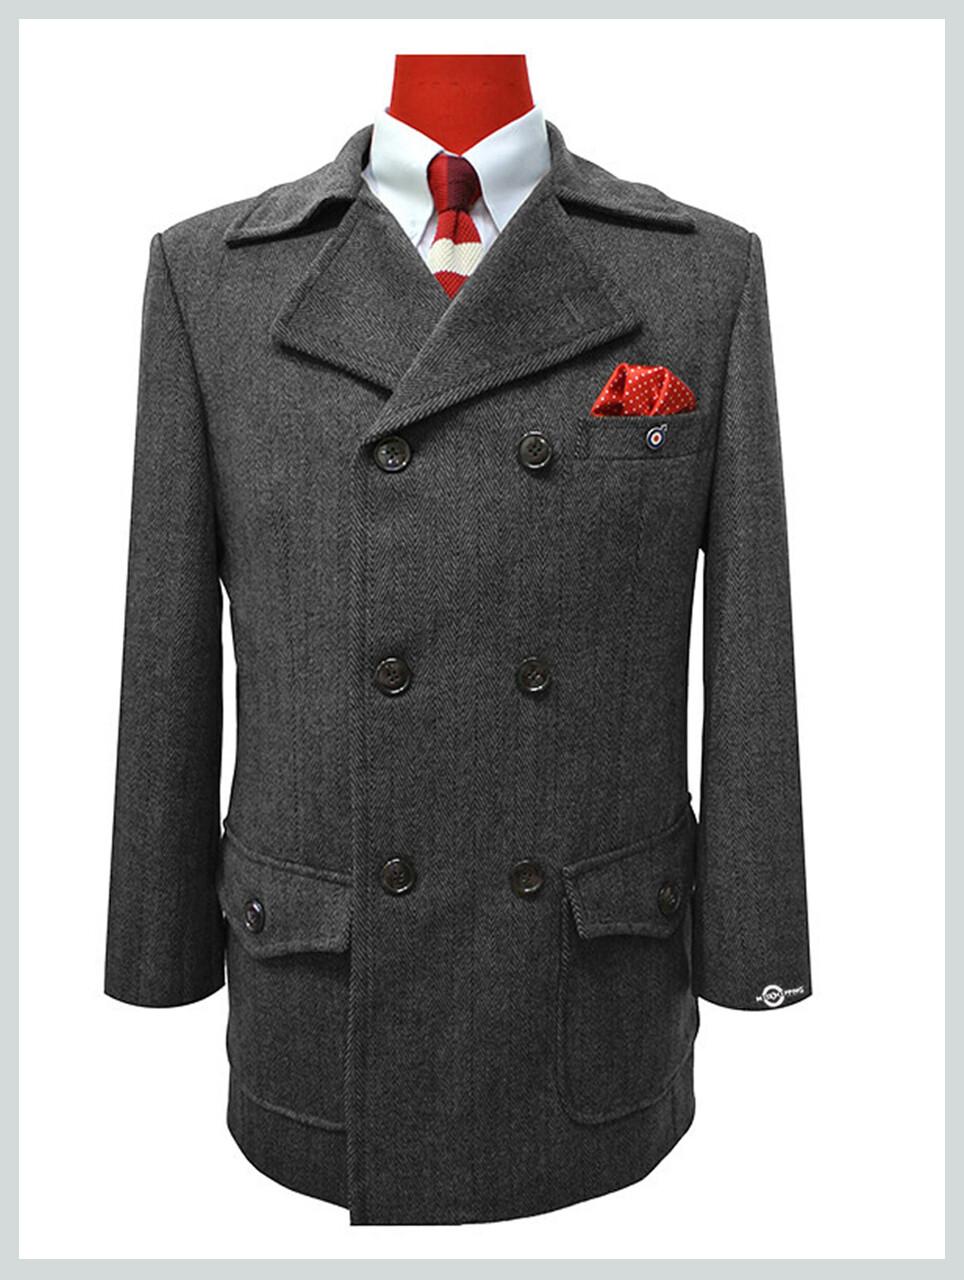 Pea Coat| Mod Clothing 1960s Style Vintage Grey Pea Coat